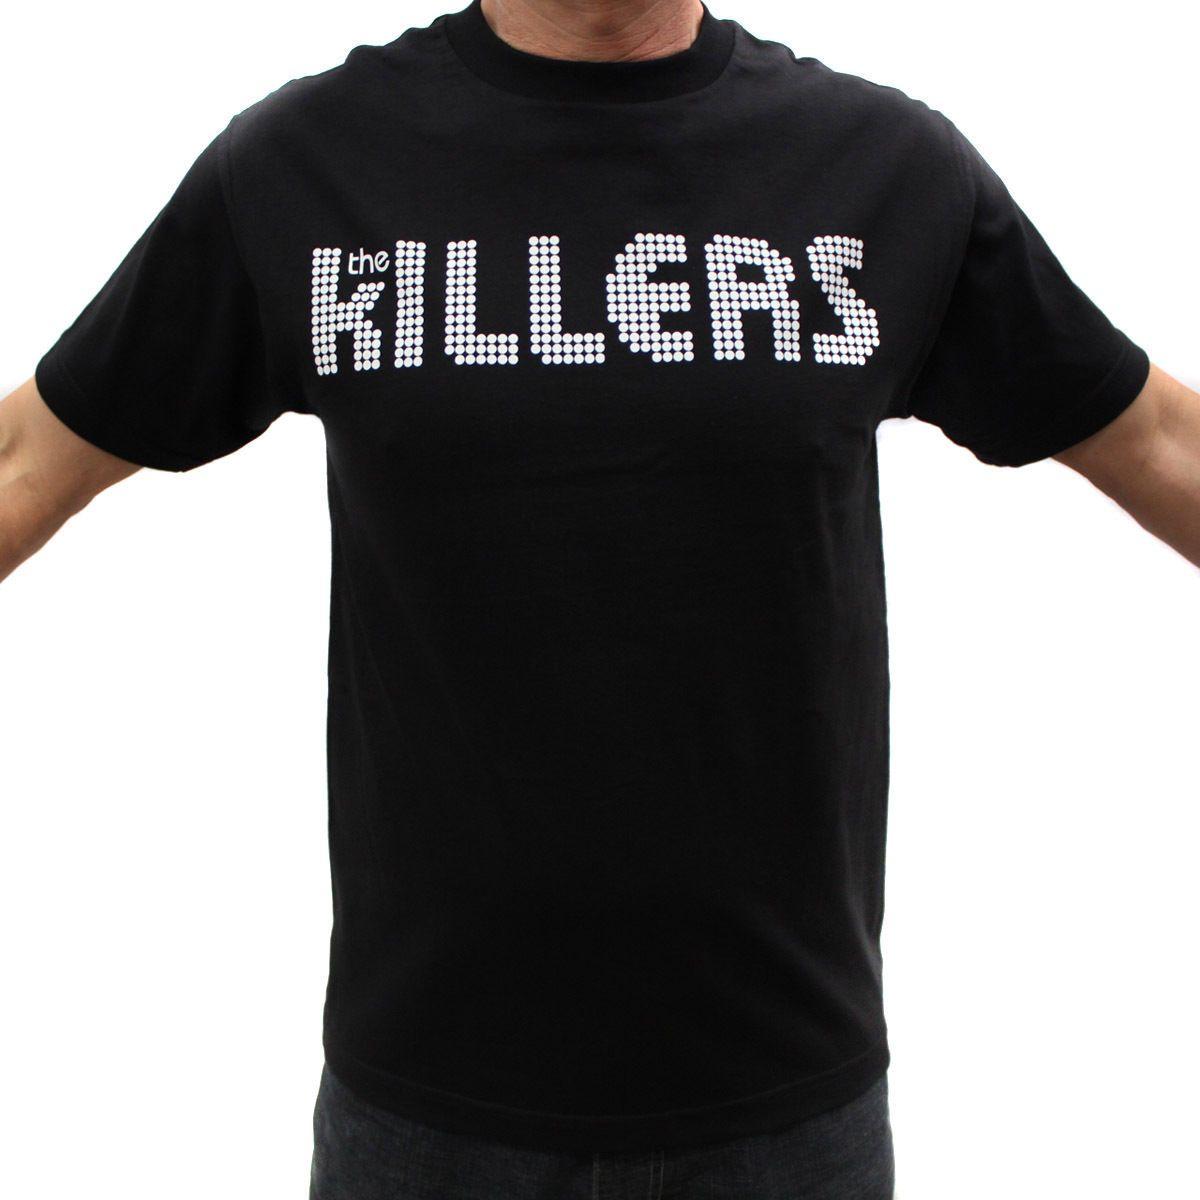 79d7e5a1294cd Compre The Killers Rock Band Graphic Camisetas A  10.36 Del Tataiskanda